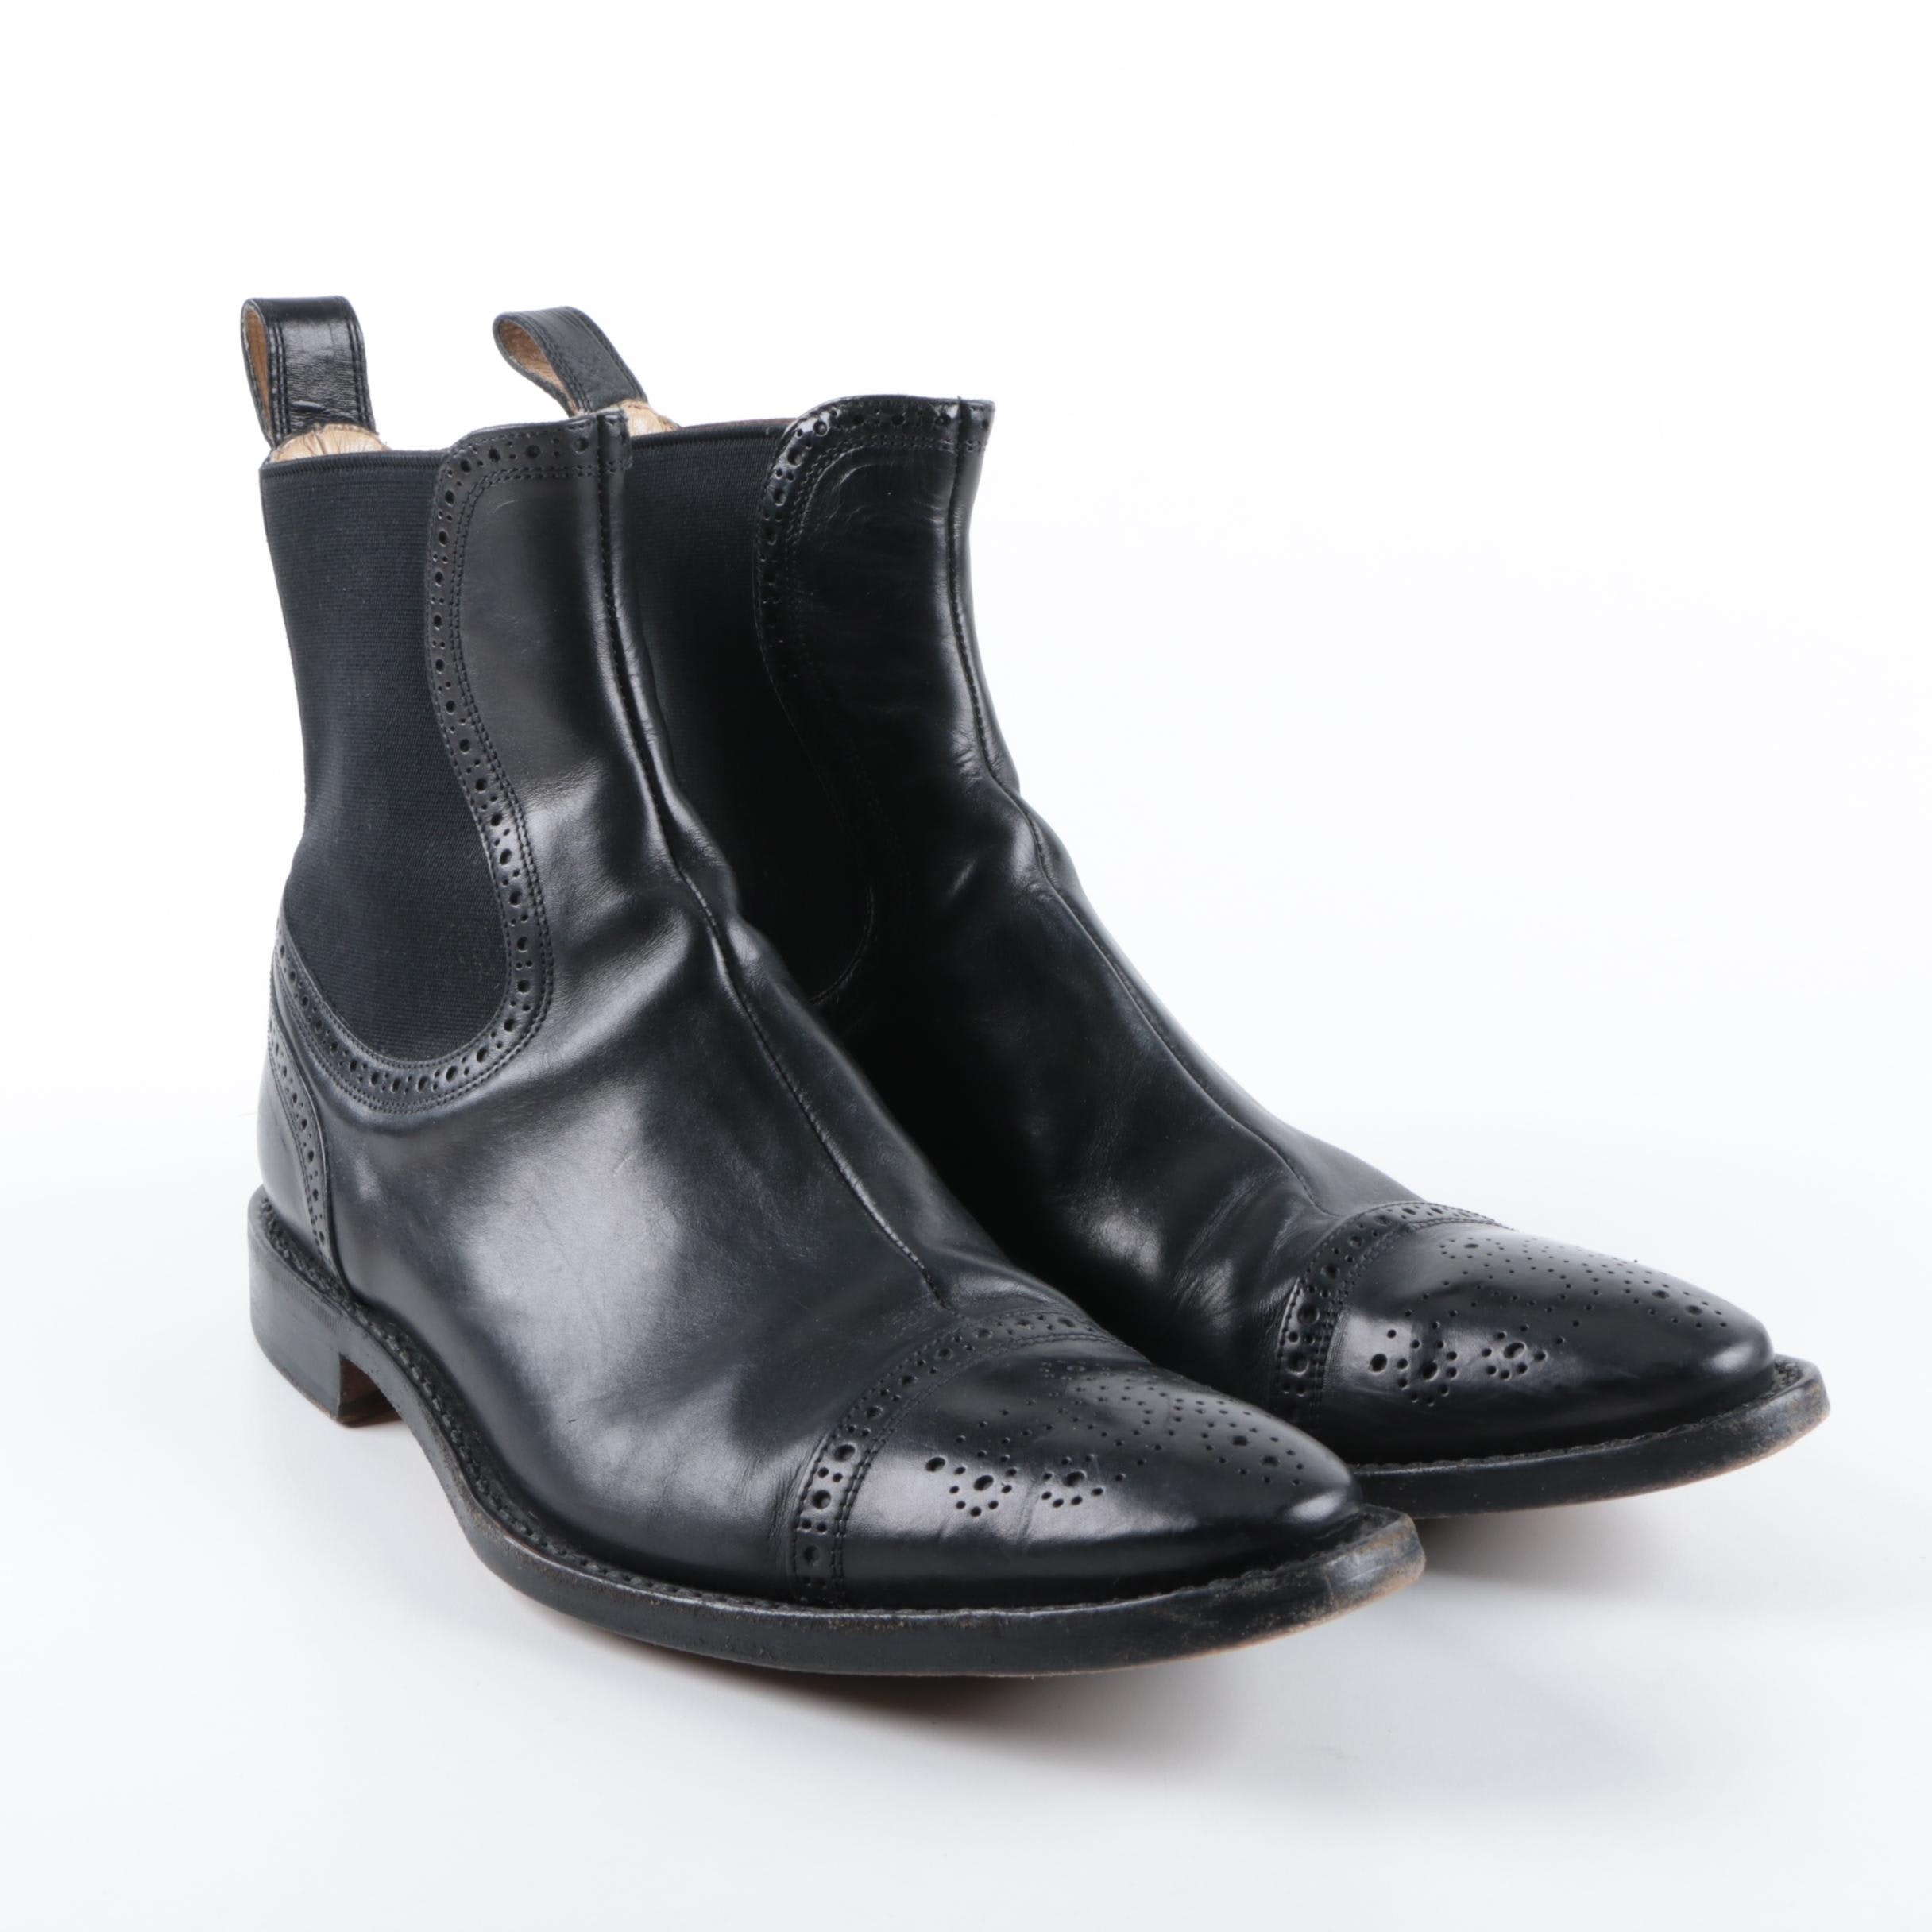 Men's Dolce & Gabbana Black Leather Boots